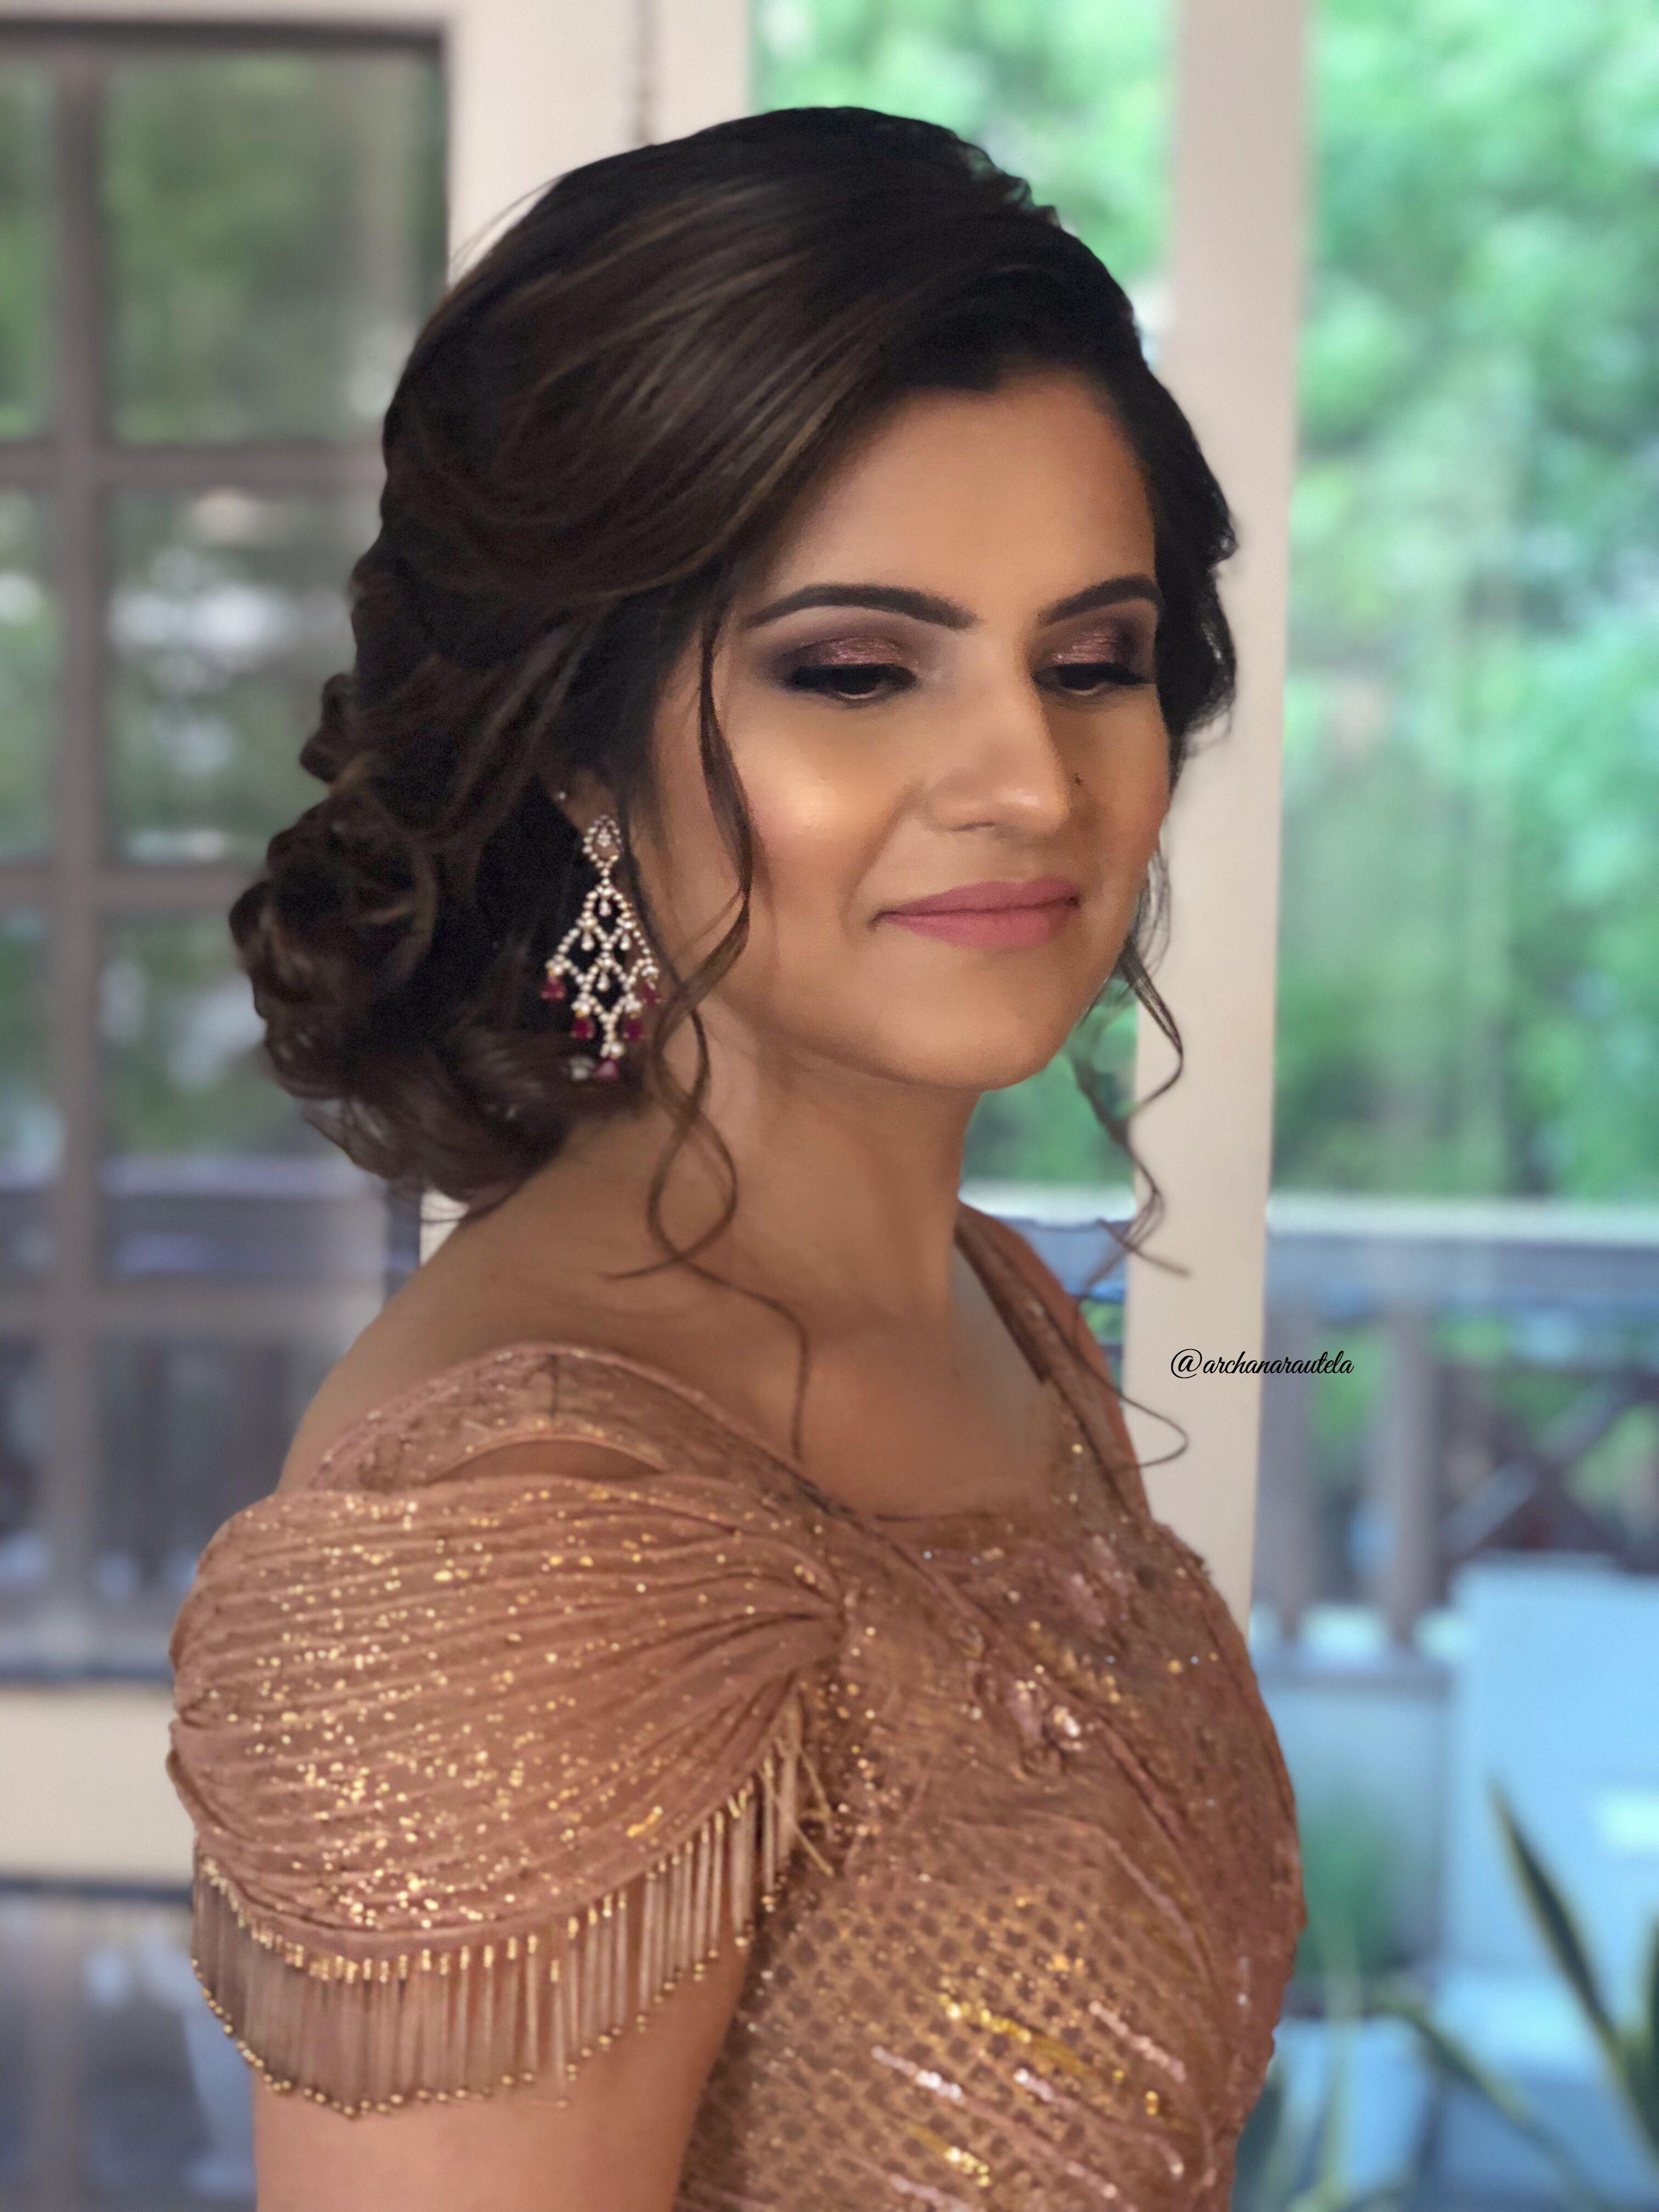 The softness of hair 🌟⭐️💋💋⭐️🌟 elegant Hair Artistry By ...